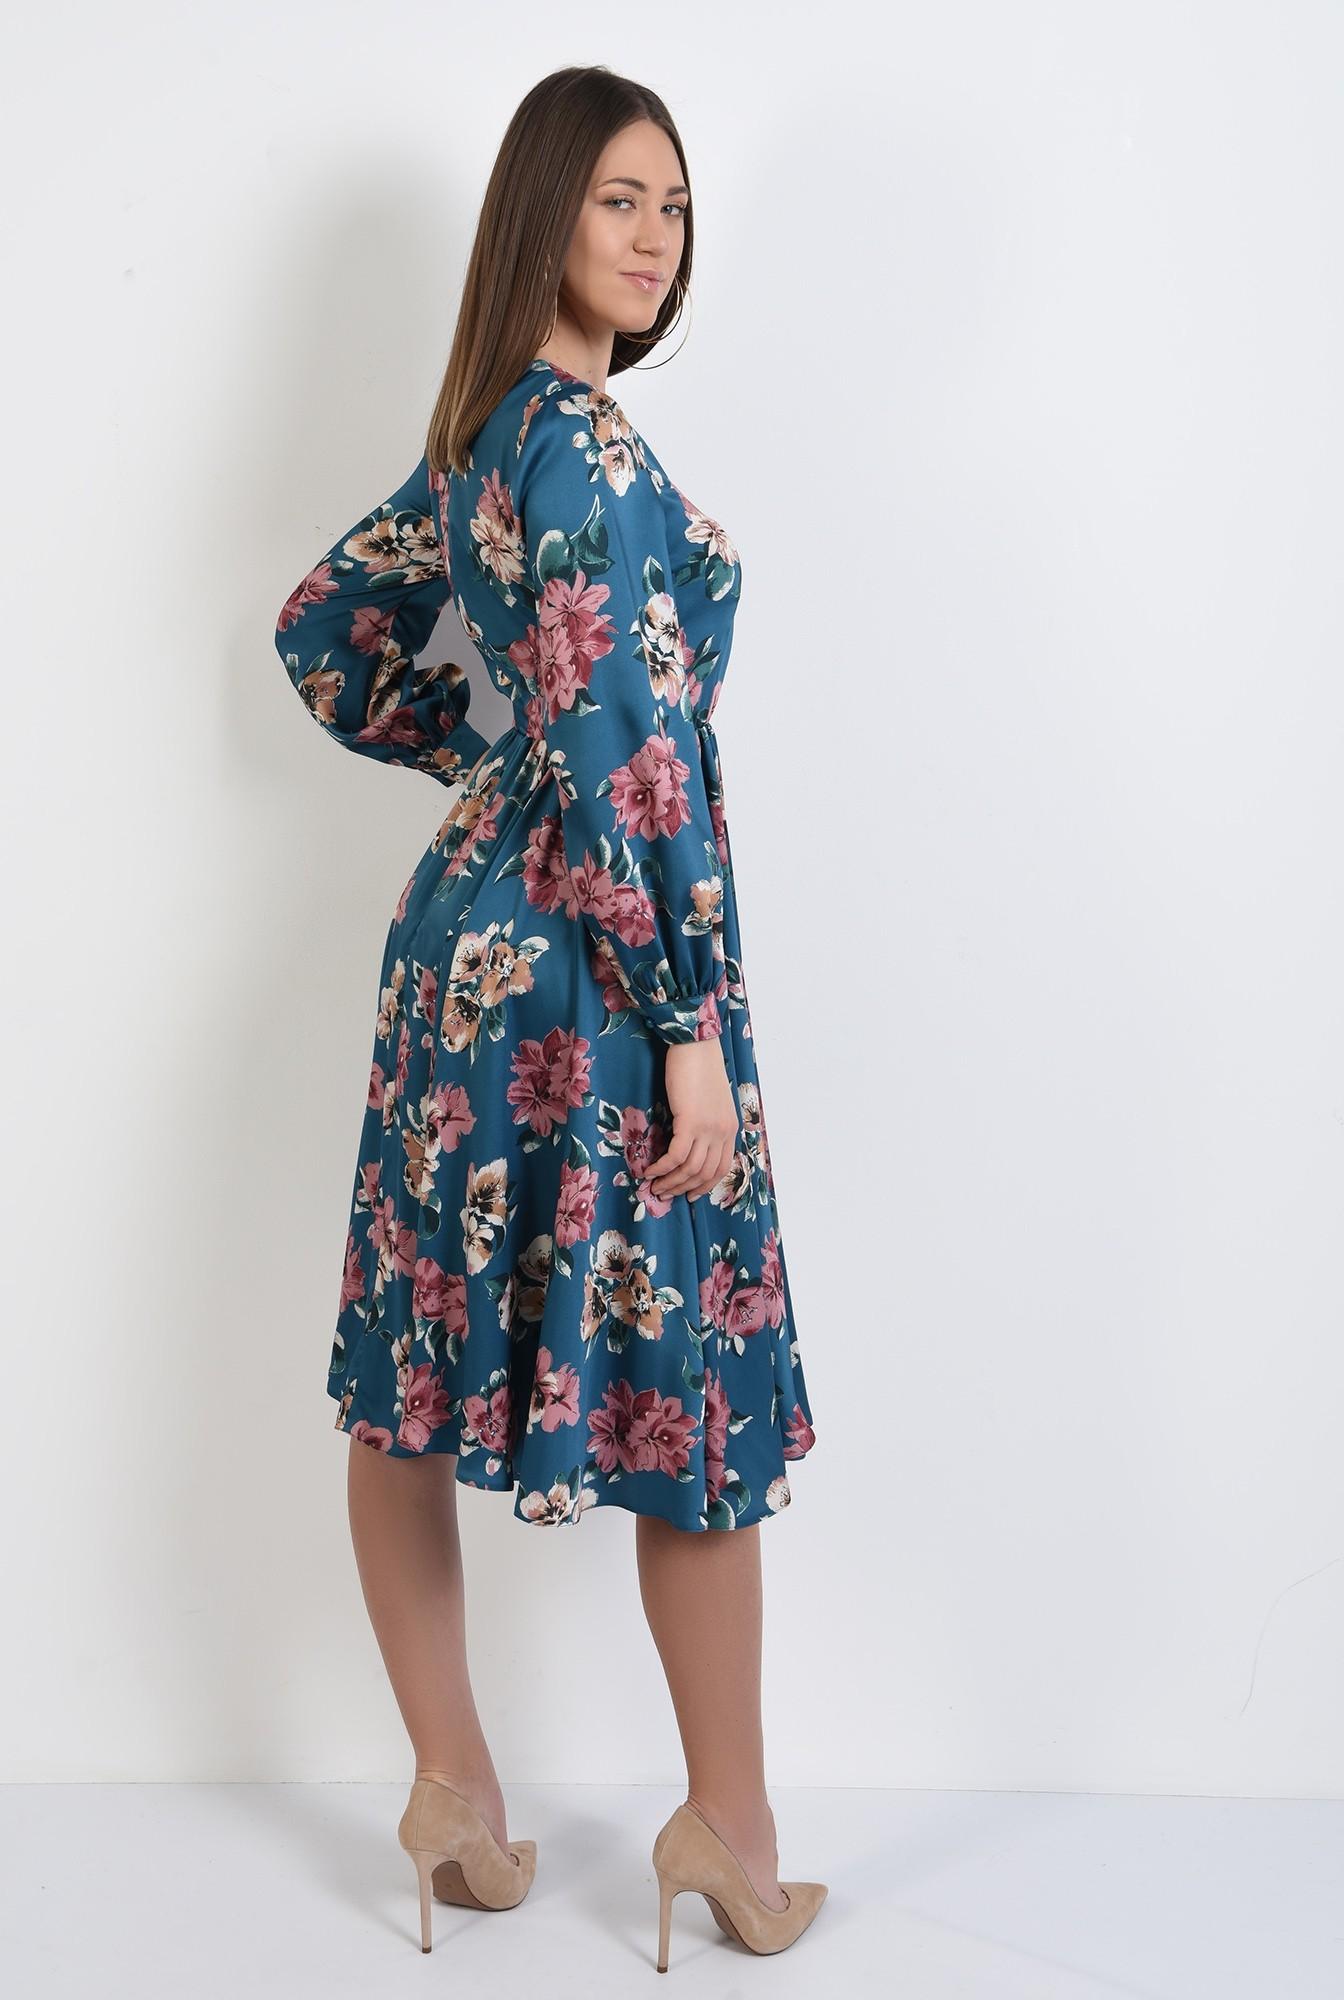 1 - 360 - rochie de primavara, clos, cu imprimeu floral, evazata, maneci lungi bufante